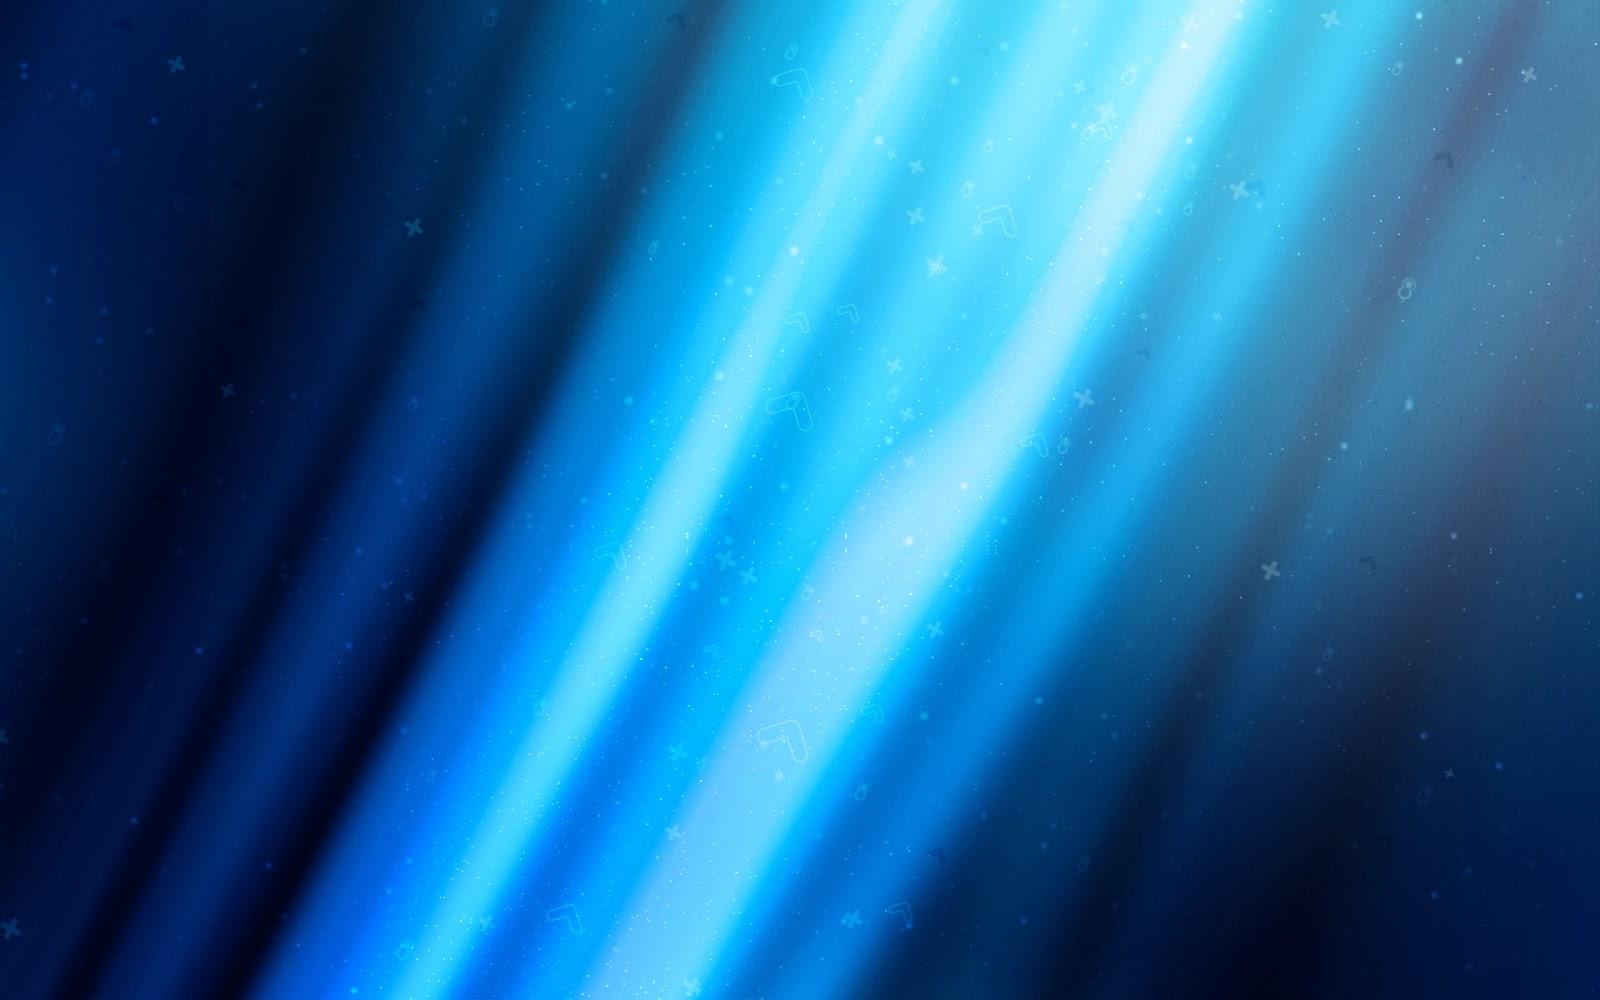 Fondo De Pantalla Abstracto Corriente De Cruces: Fondo De Pantalla Abstracto Energia Azul